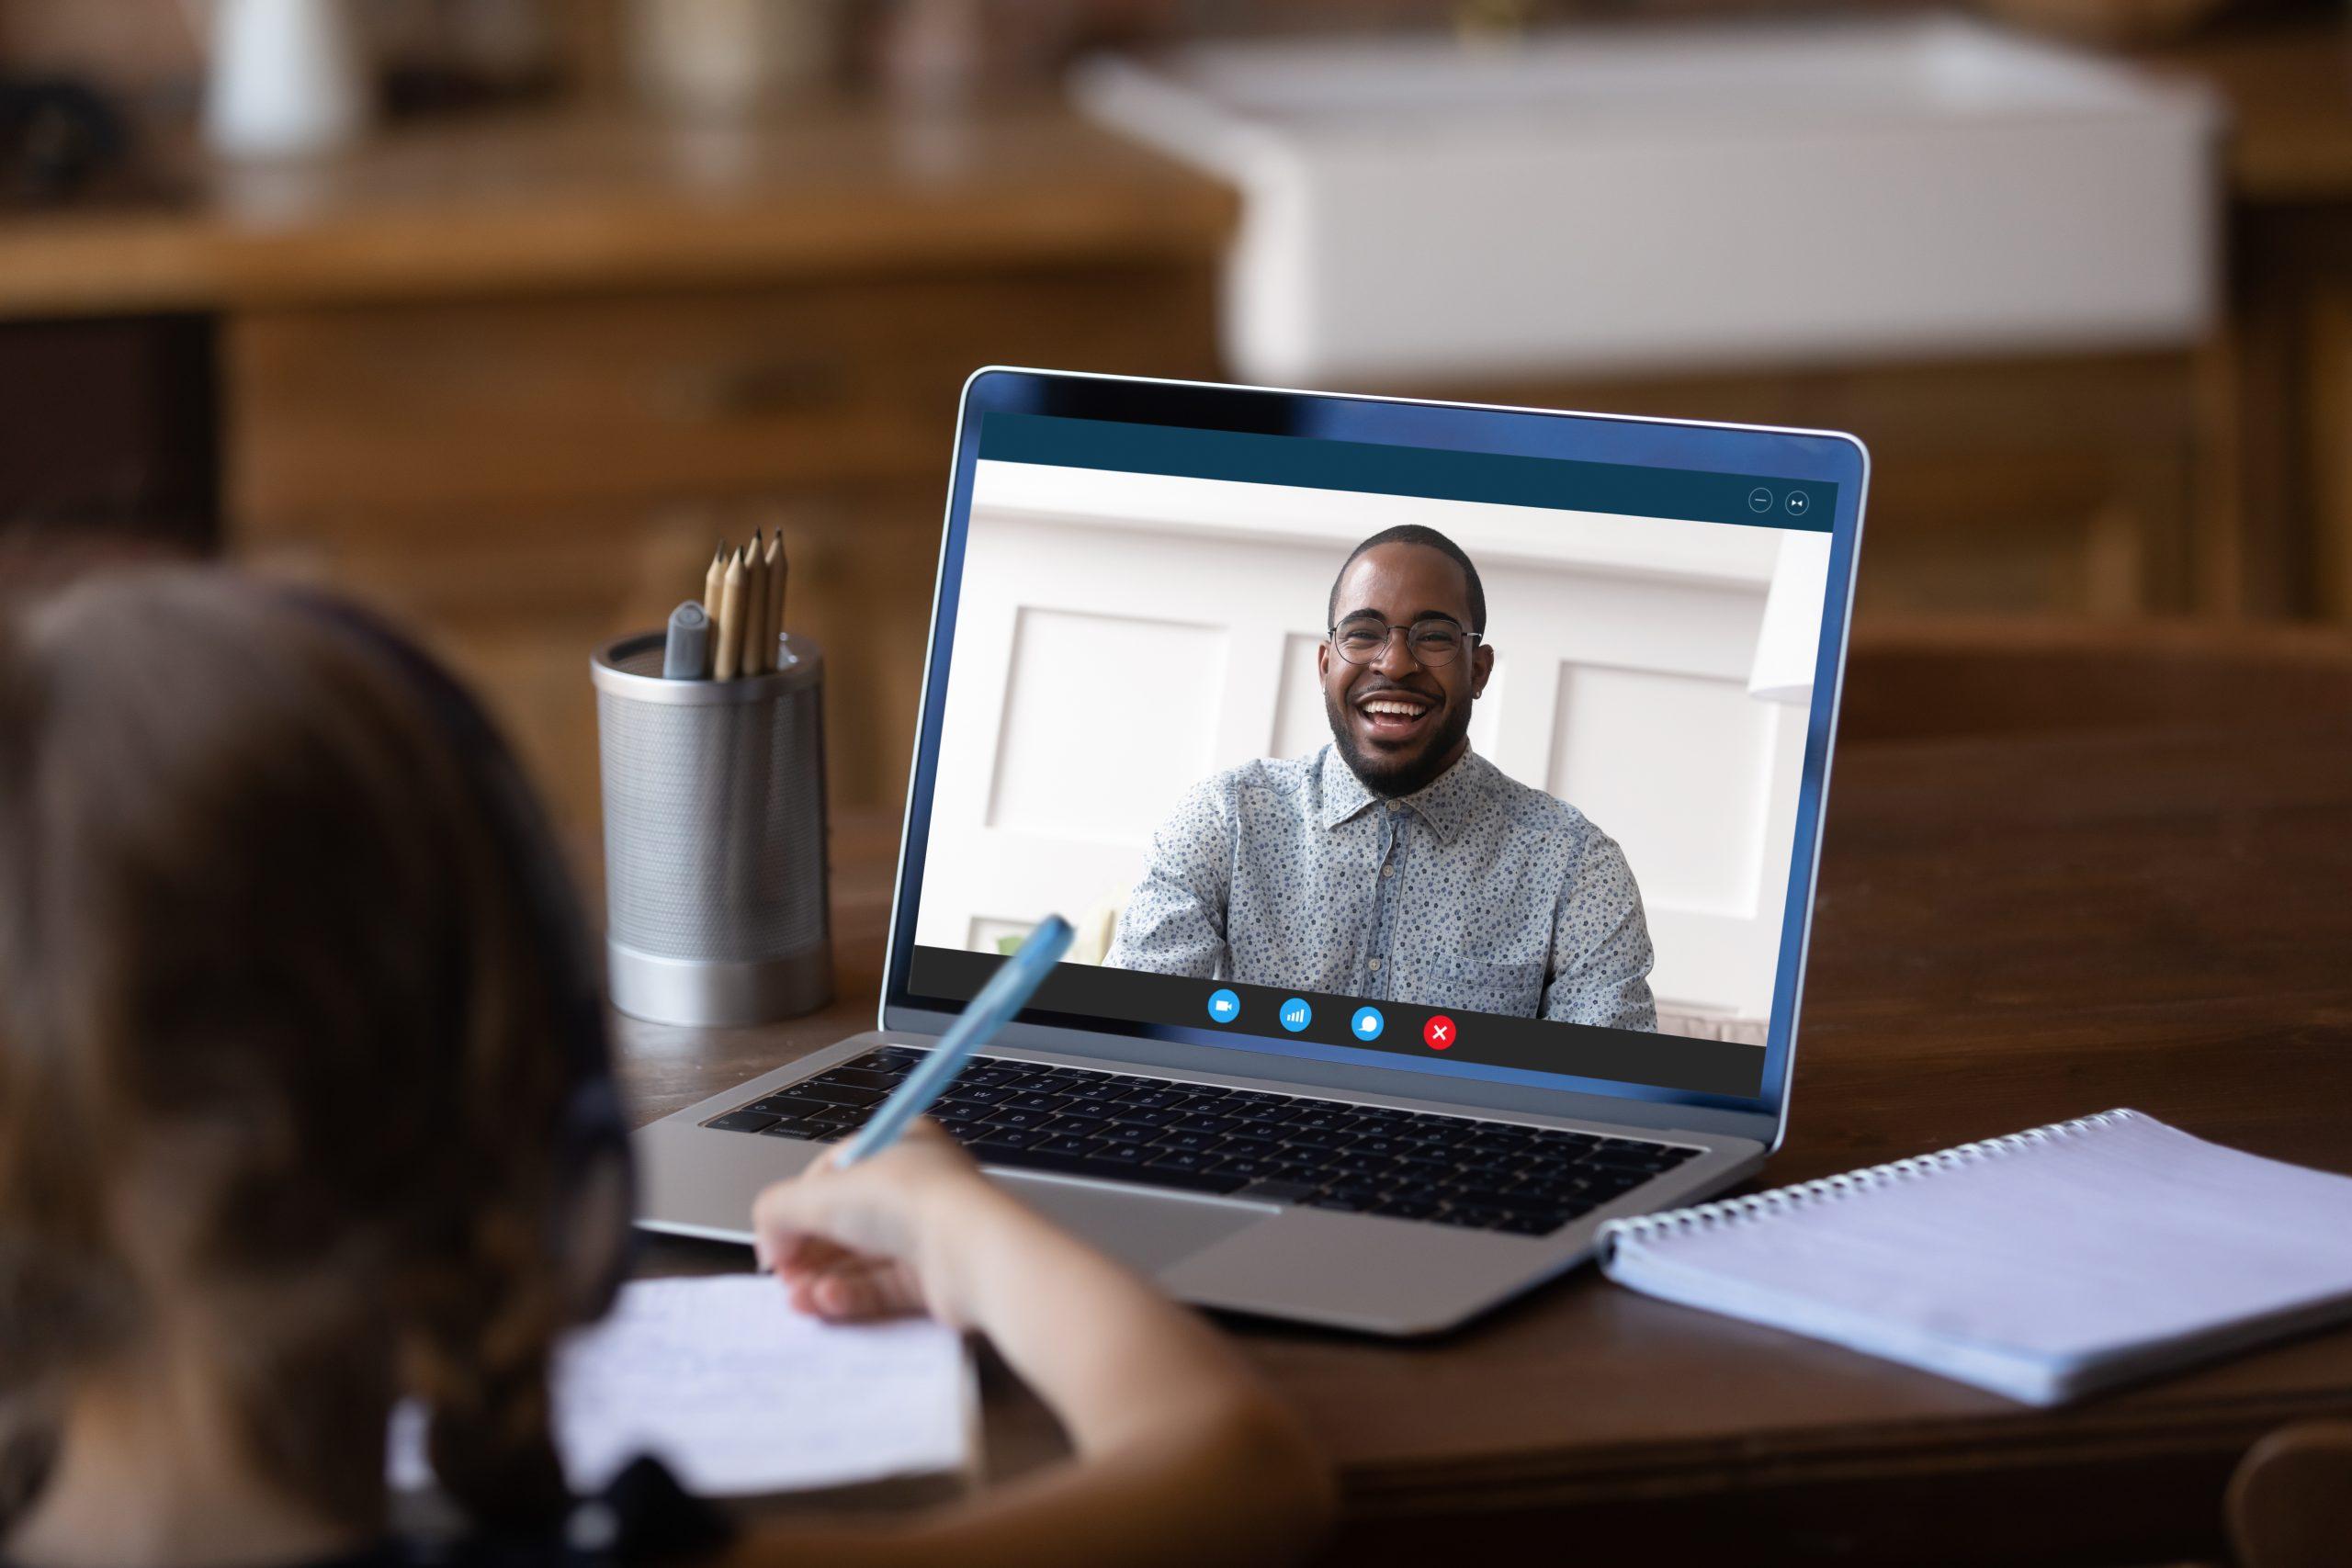 Georgia virtual teacher helping girl with lesson